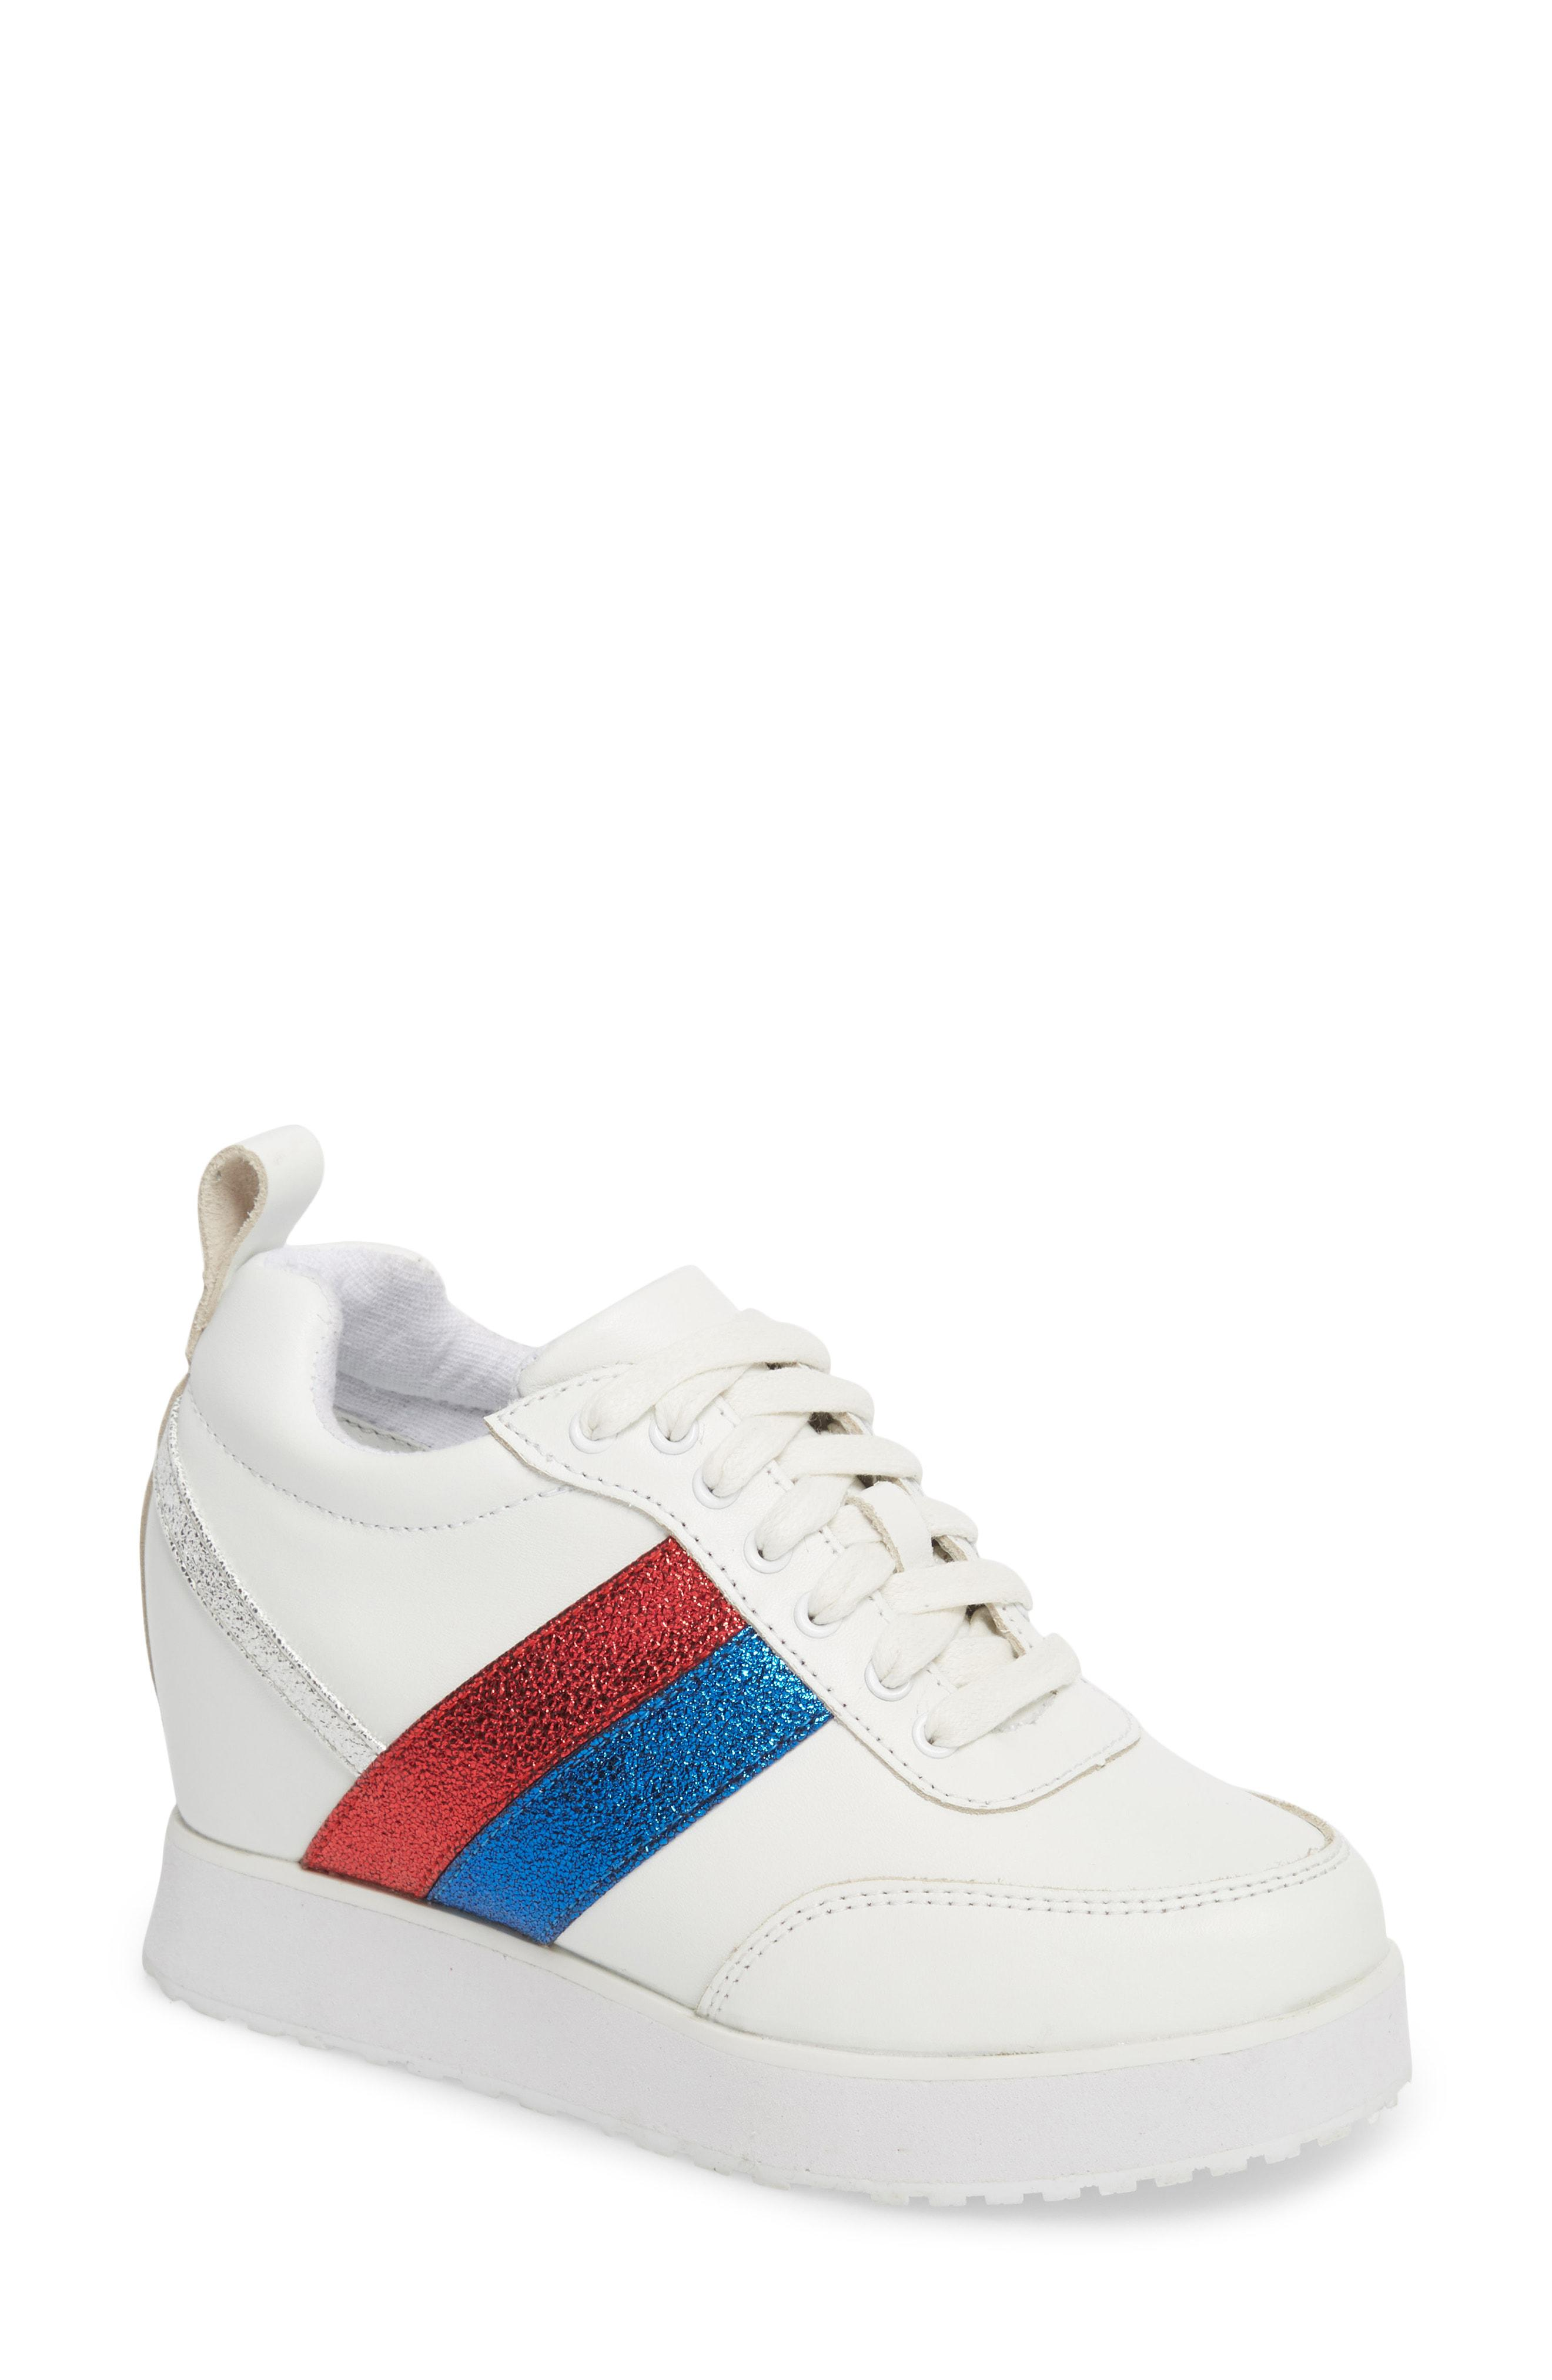 534f7cb57c55 Lyst - Very Volatile Sarita Hidden Wedge Sneaker in White